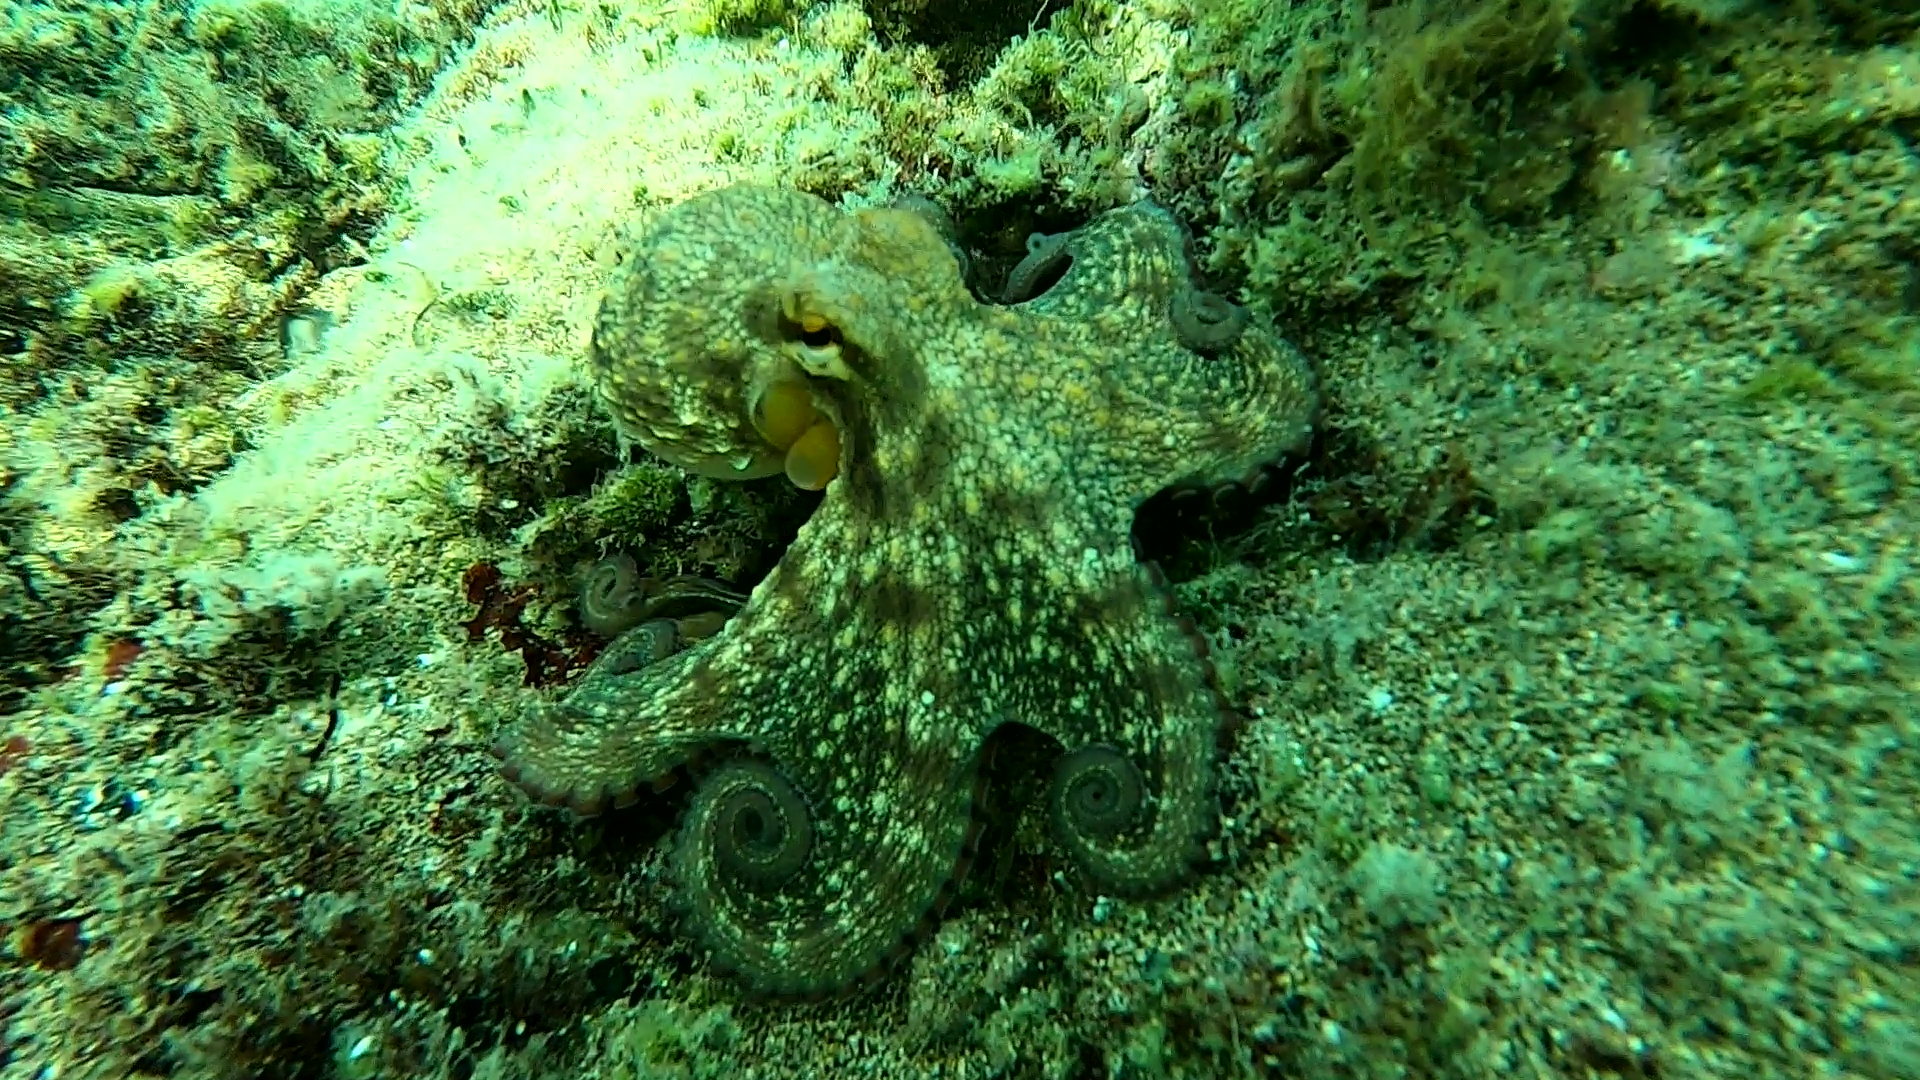 Polpo nella sabbia - Octopus in the sand - intotheblue.it